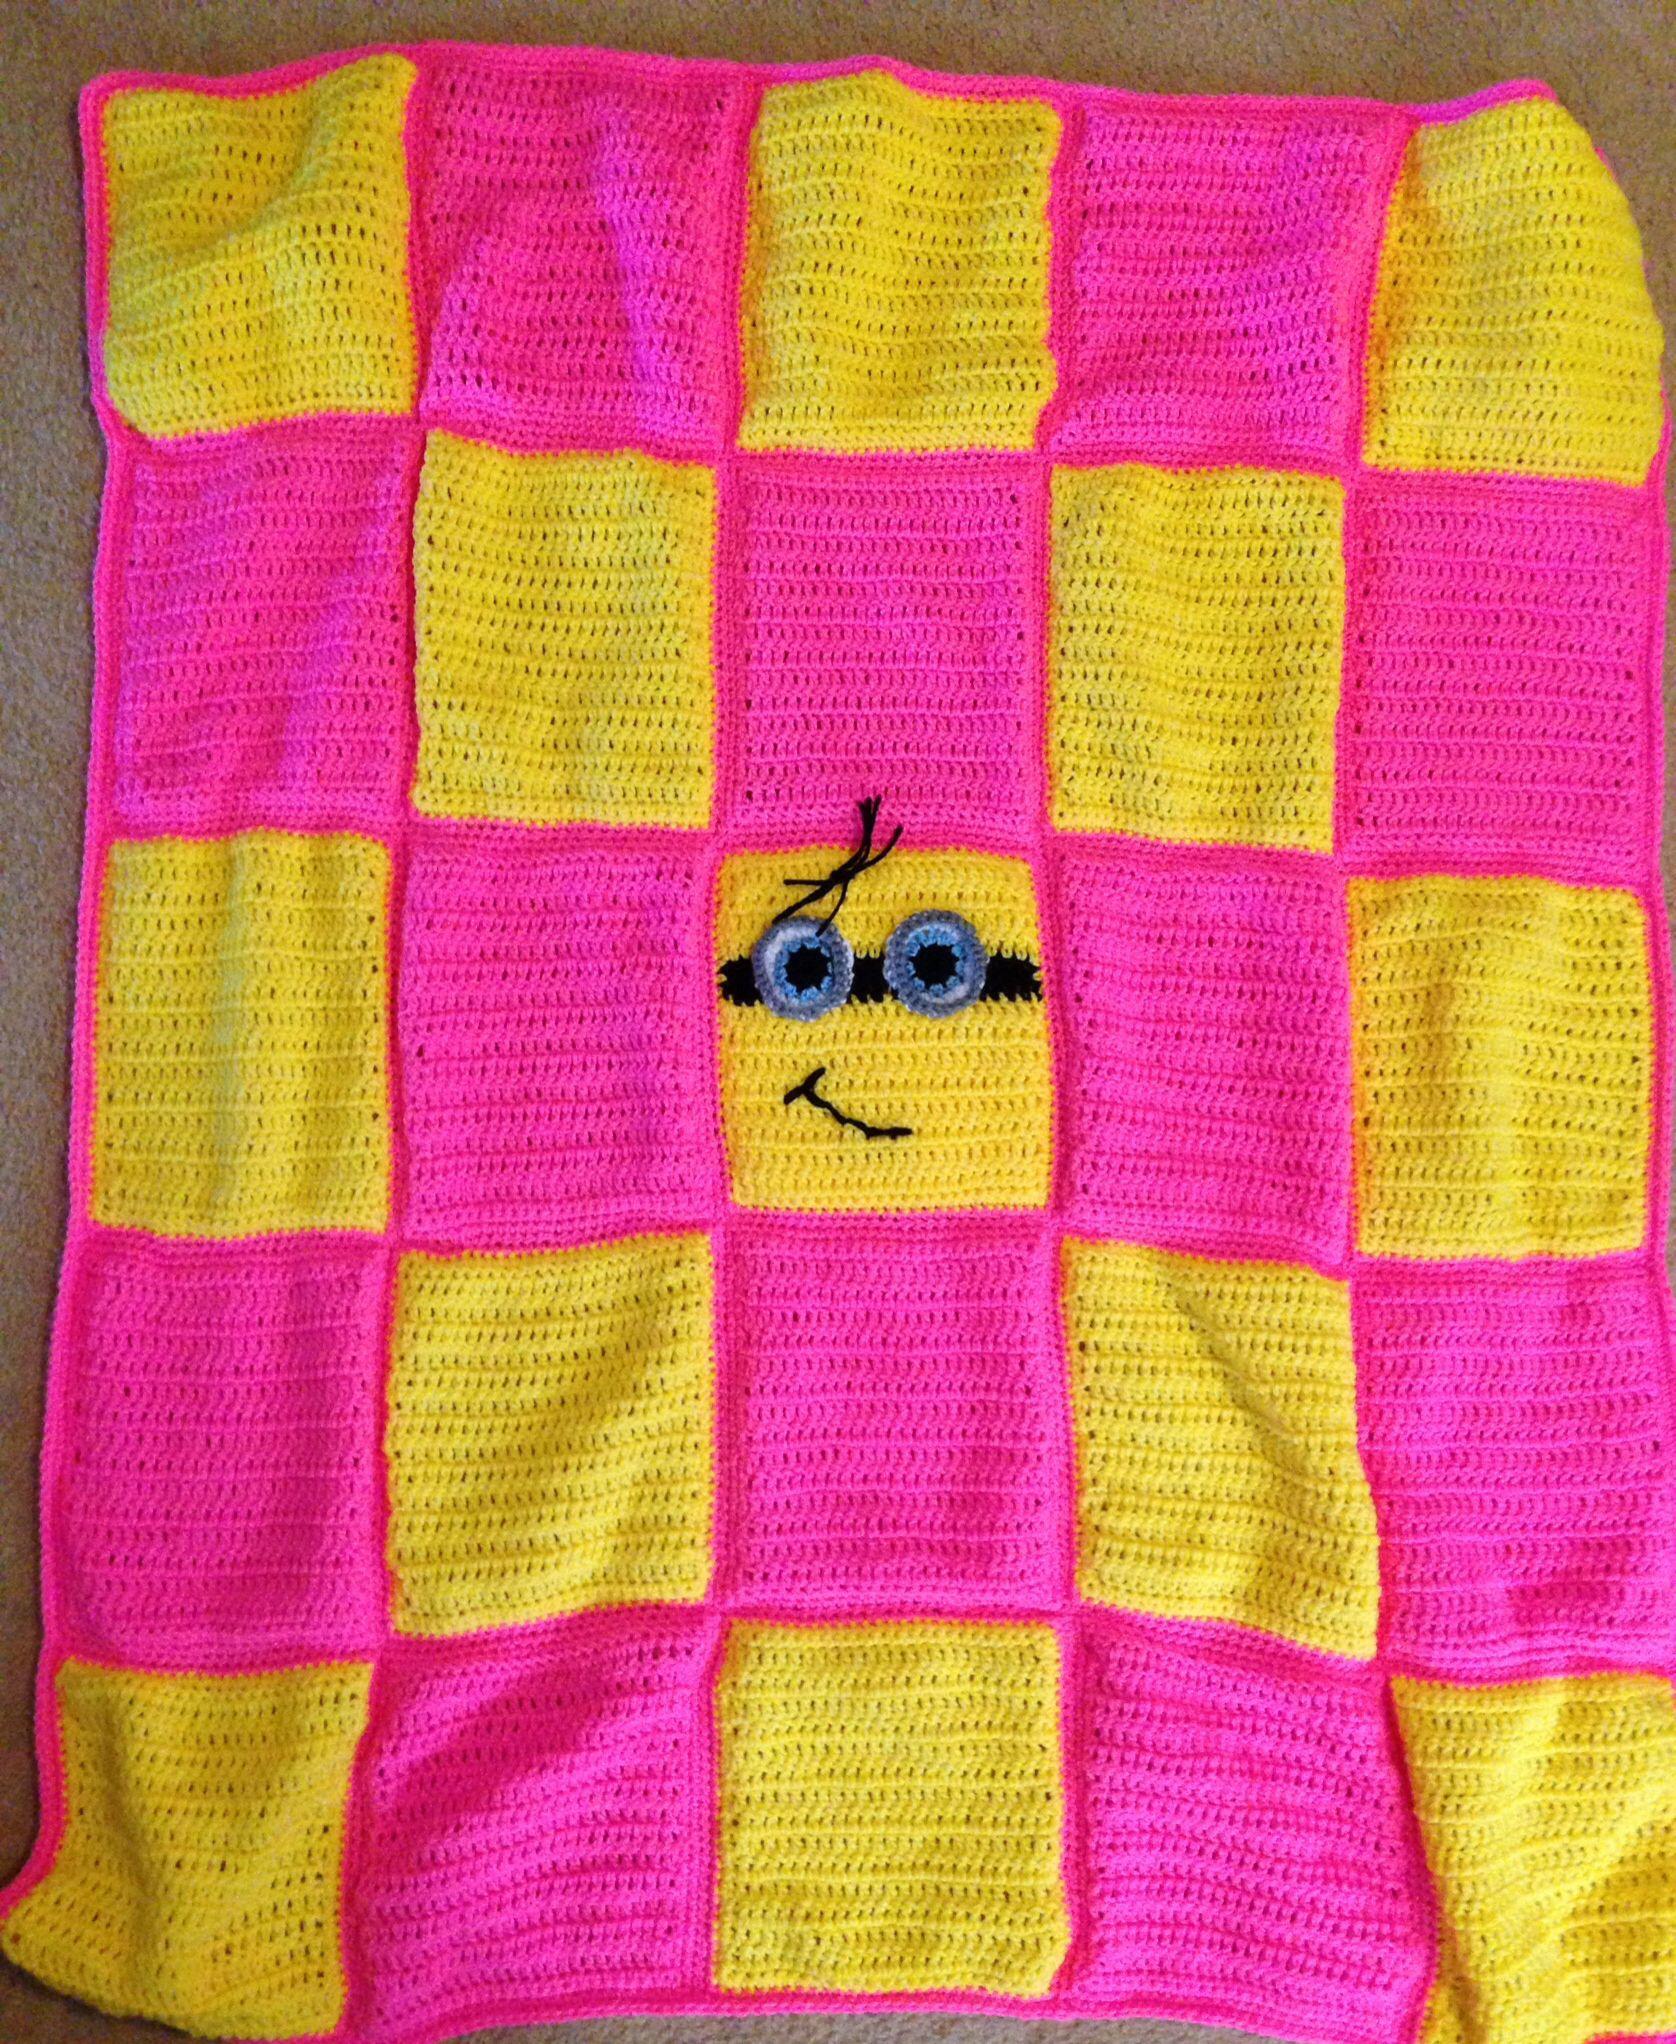 Crochet Pattern For Minion Blanket : Minion Blanket Crochet Pinterest